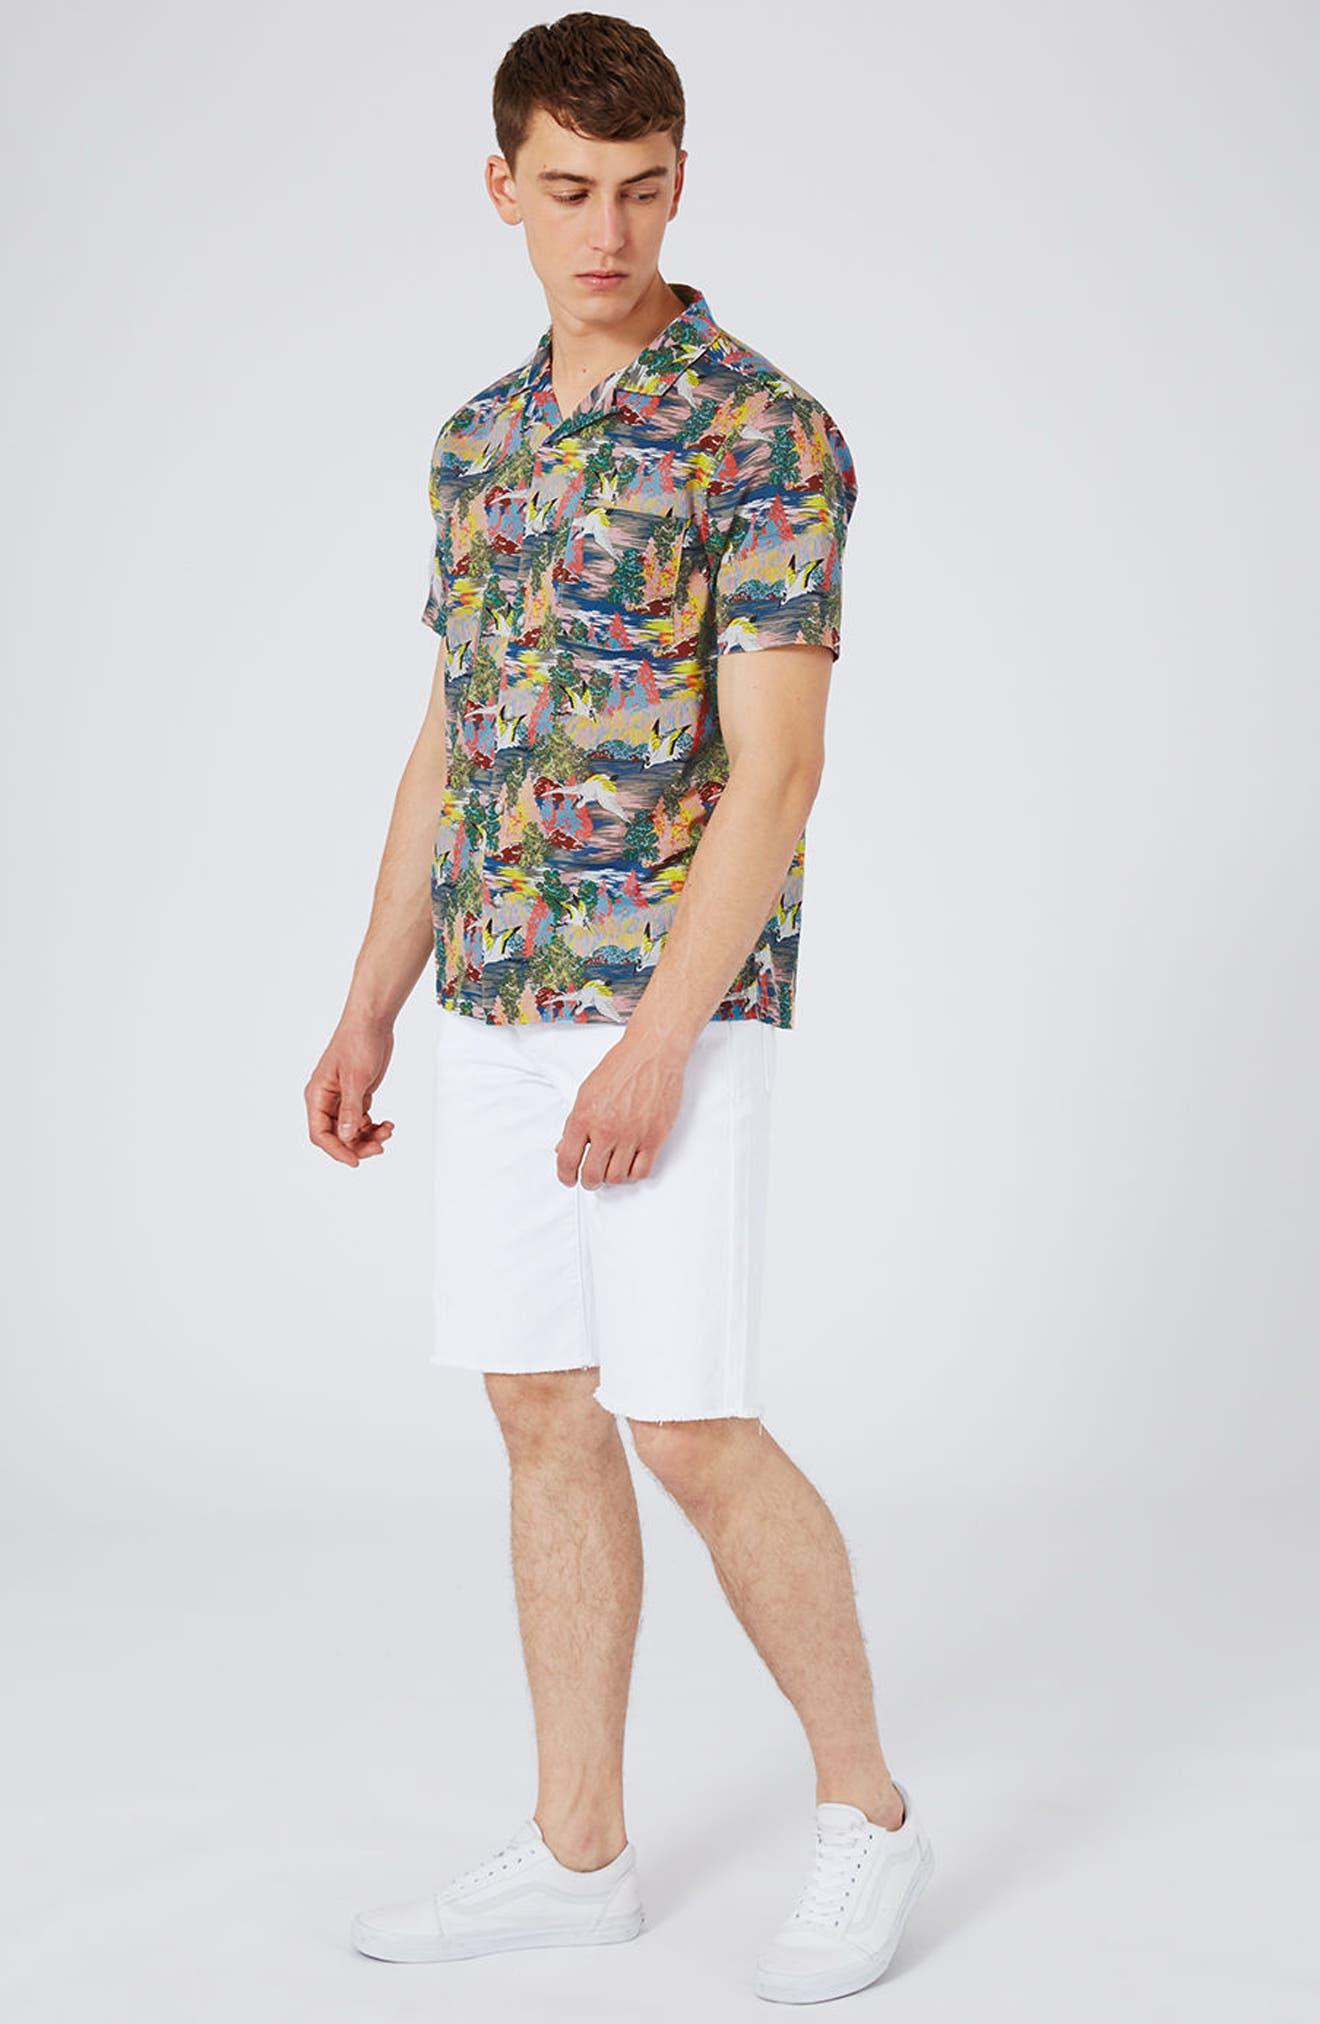 Heron Print Shirt,                             Alternate thumbnail 5, color,                             400